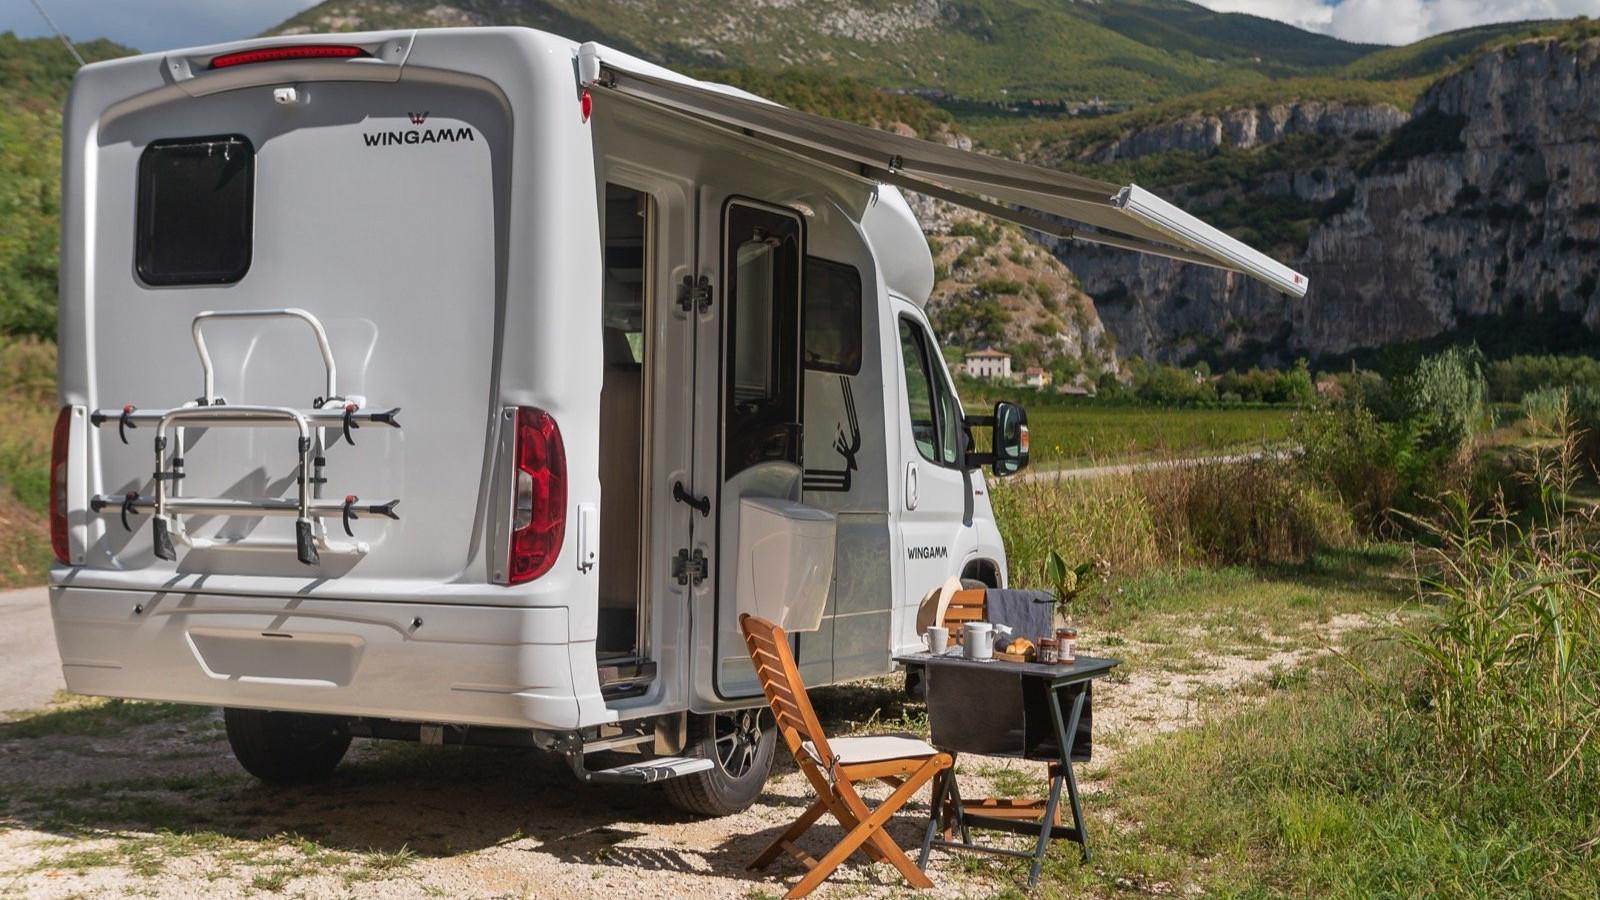 Oasi 540 - petit camping-car rv camping-car compact luxe premium camping - camping-car